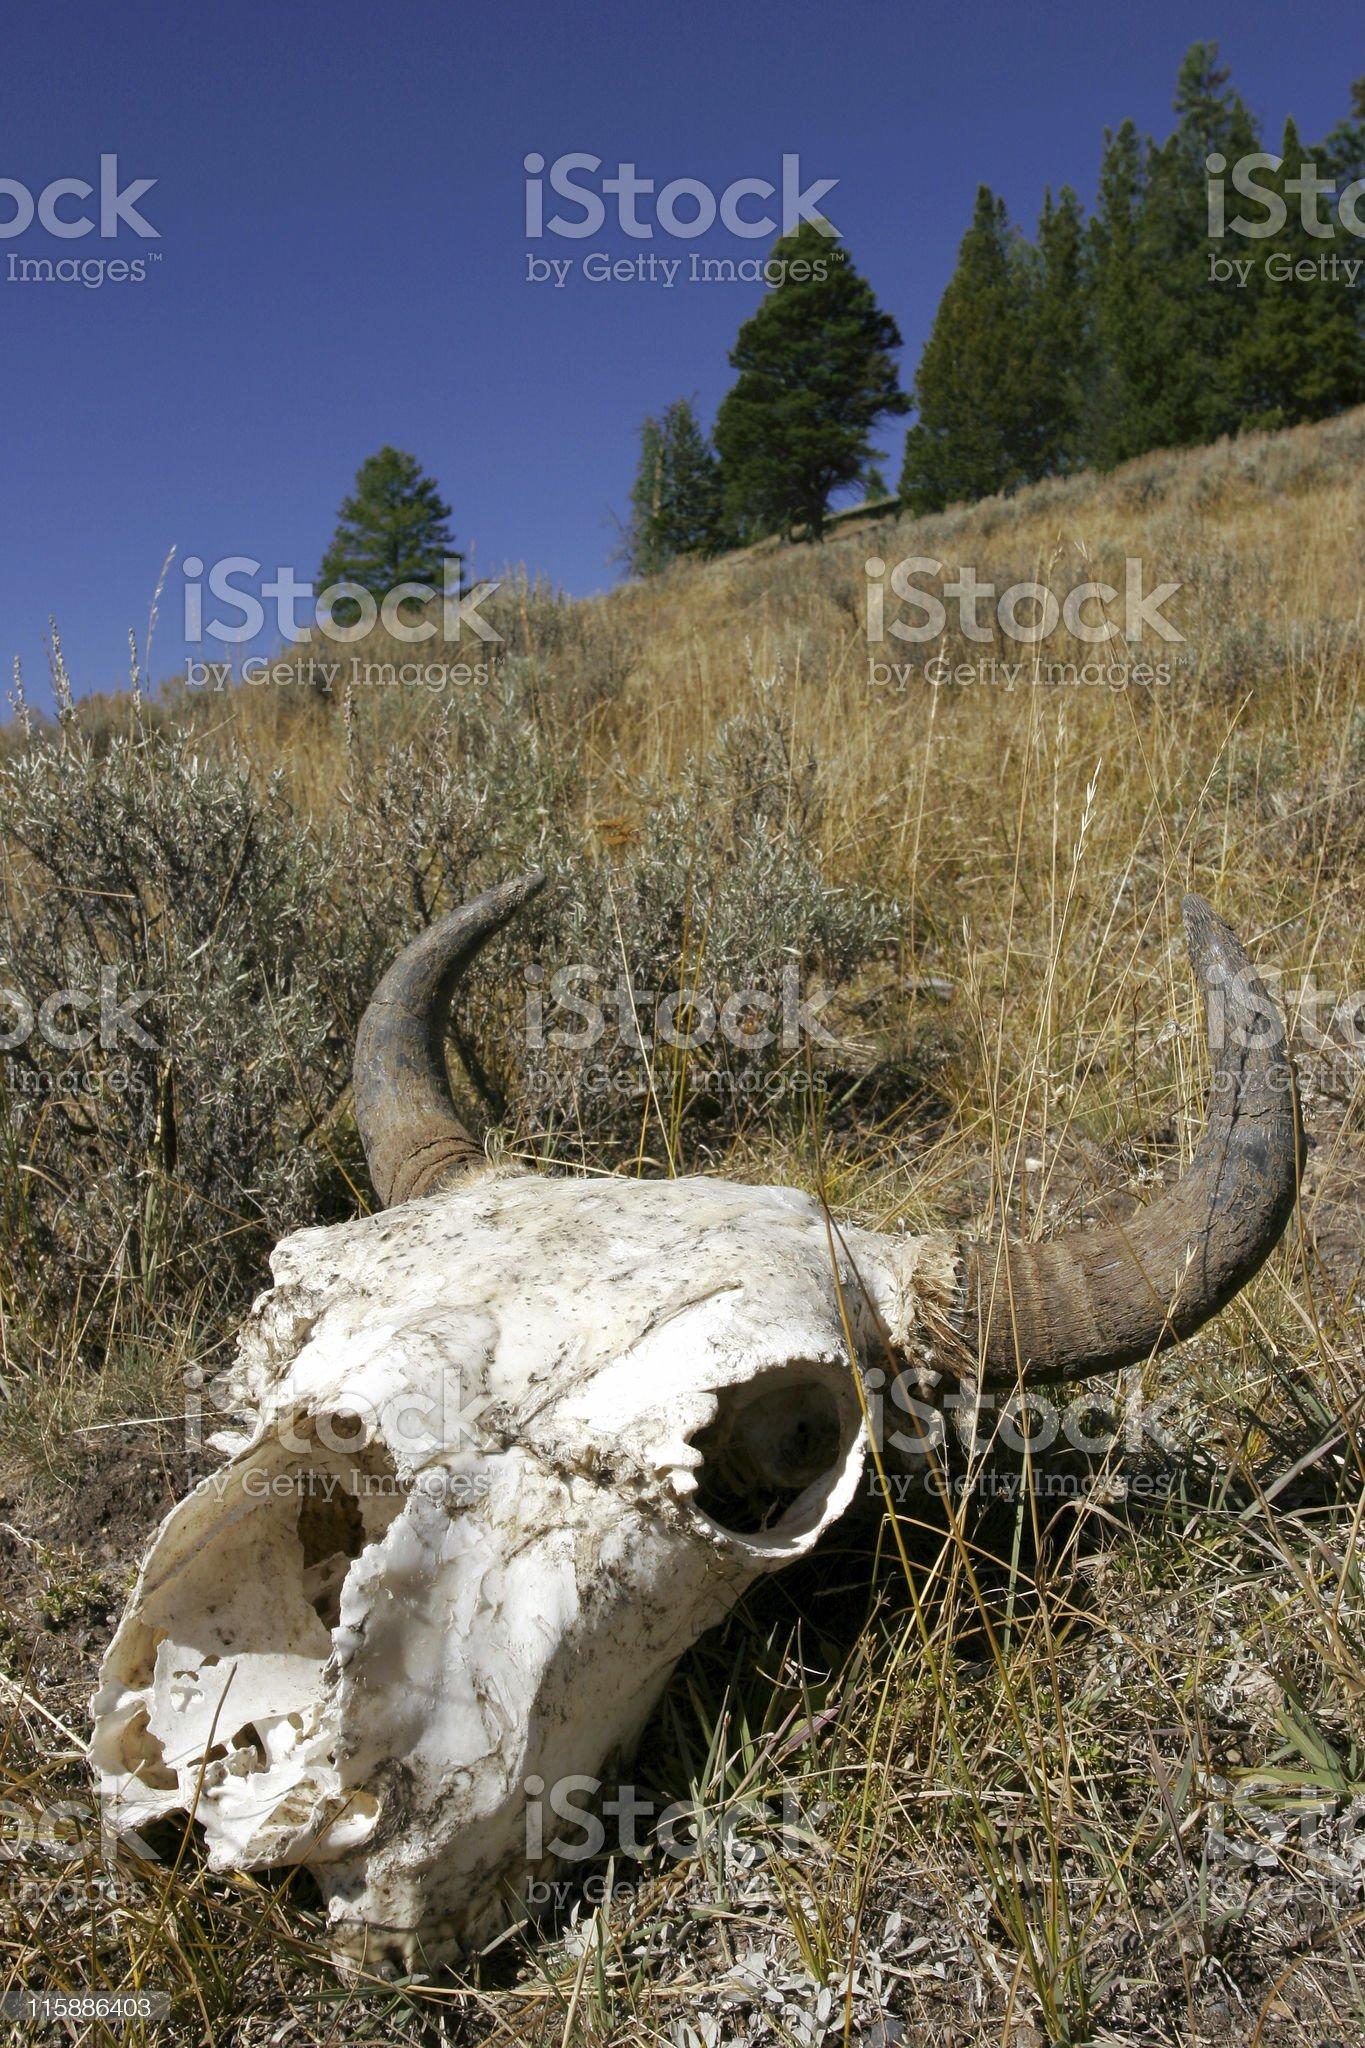 Bison Skull royalty-free stock photo